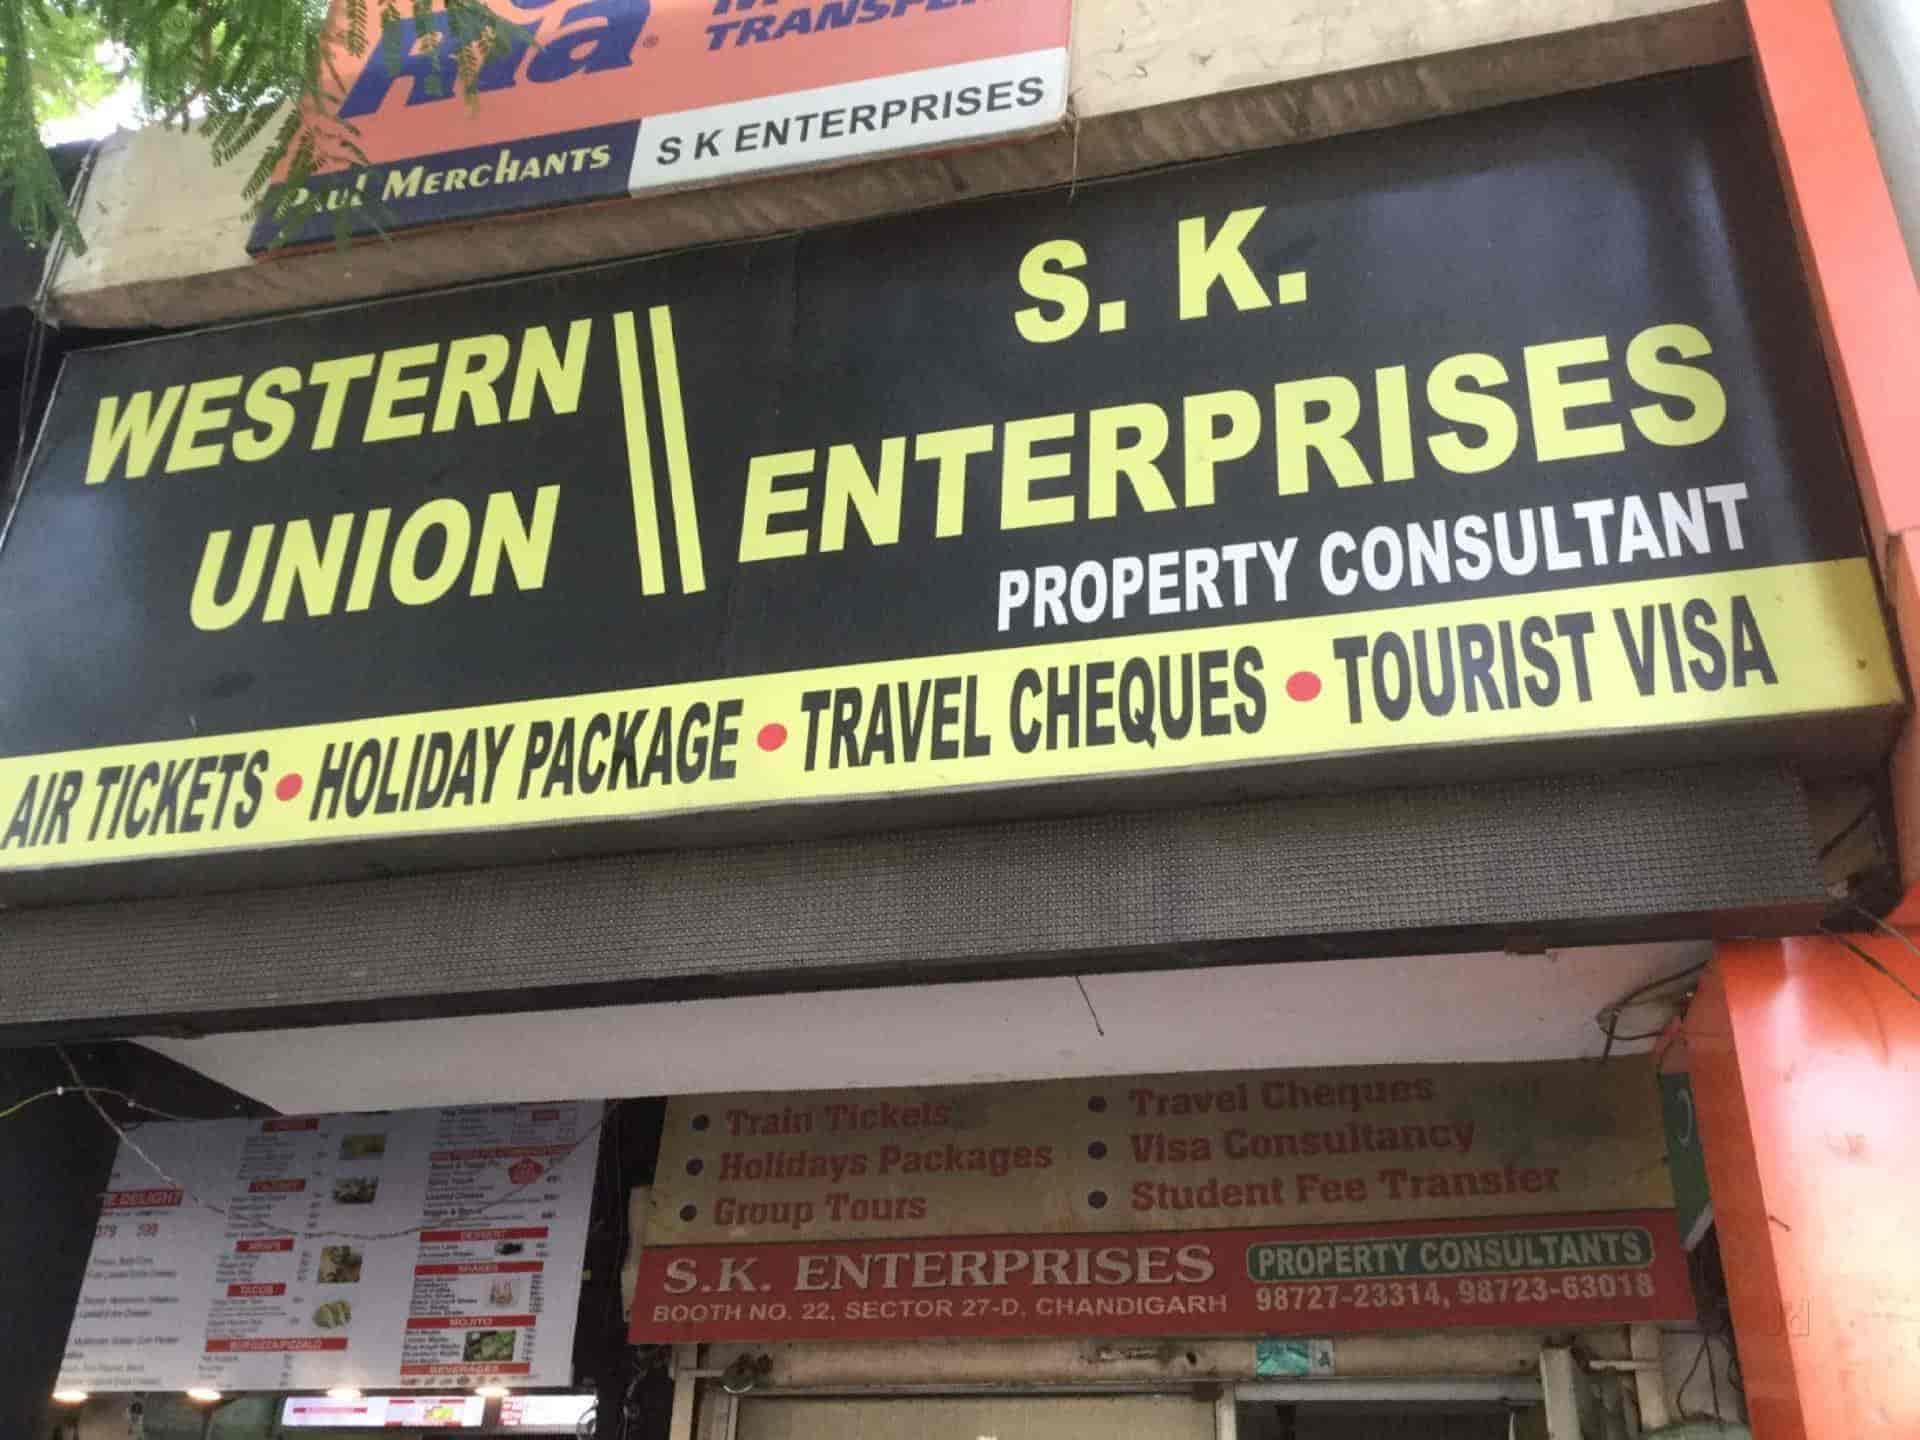 S K Enterprises, Chandigarh Sector 27d - Travel Agents in